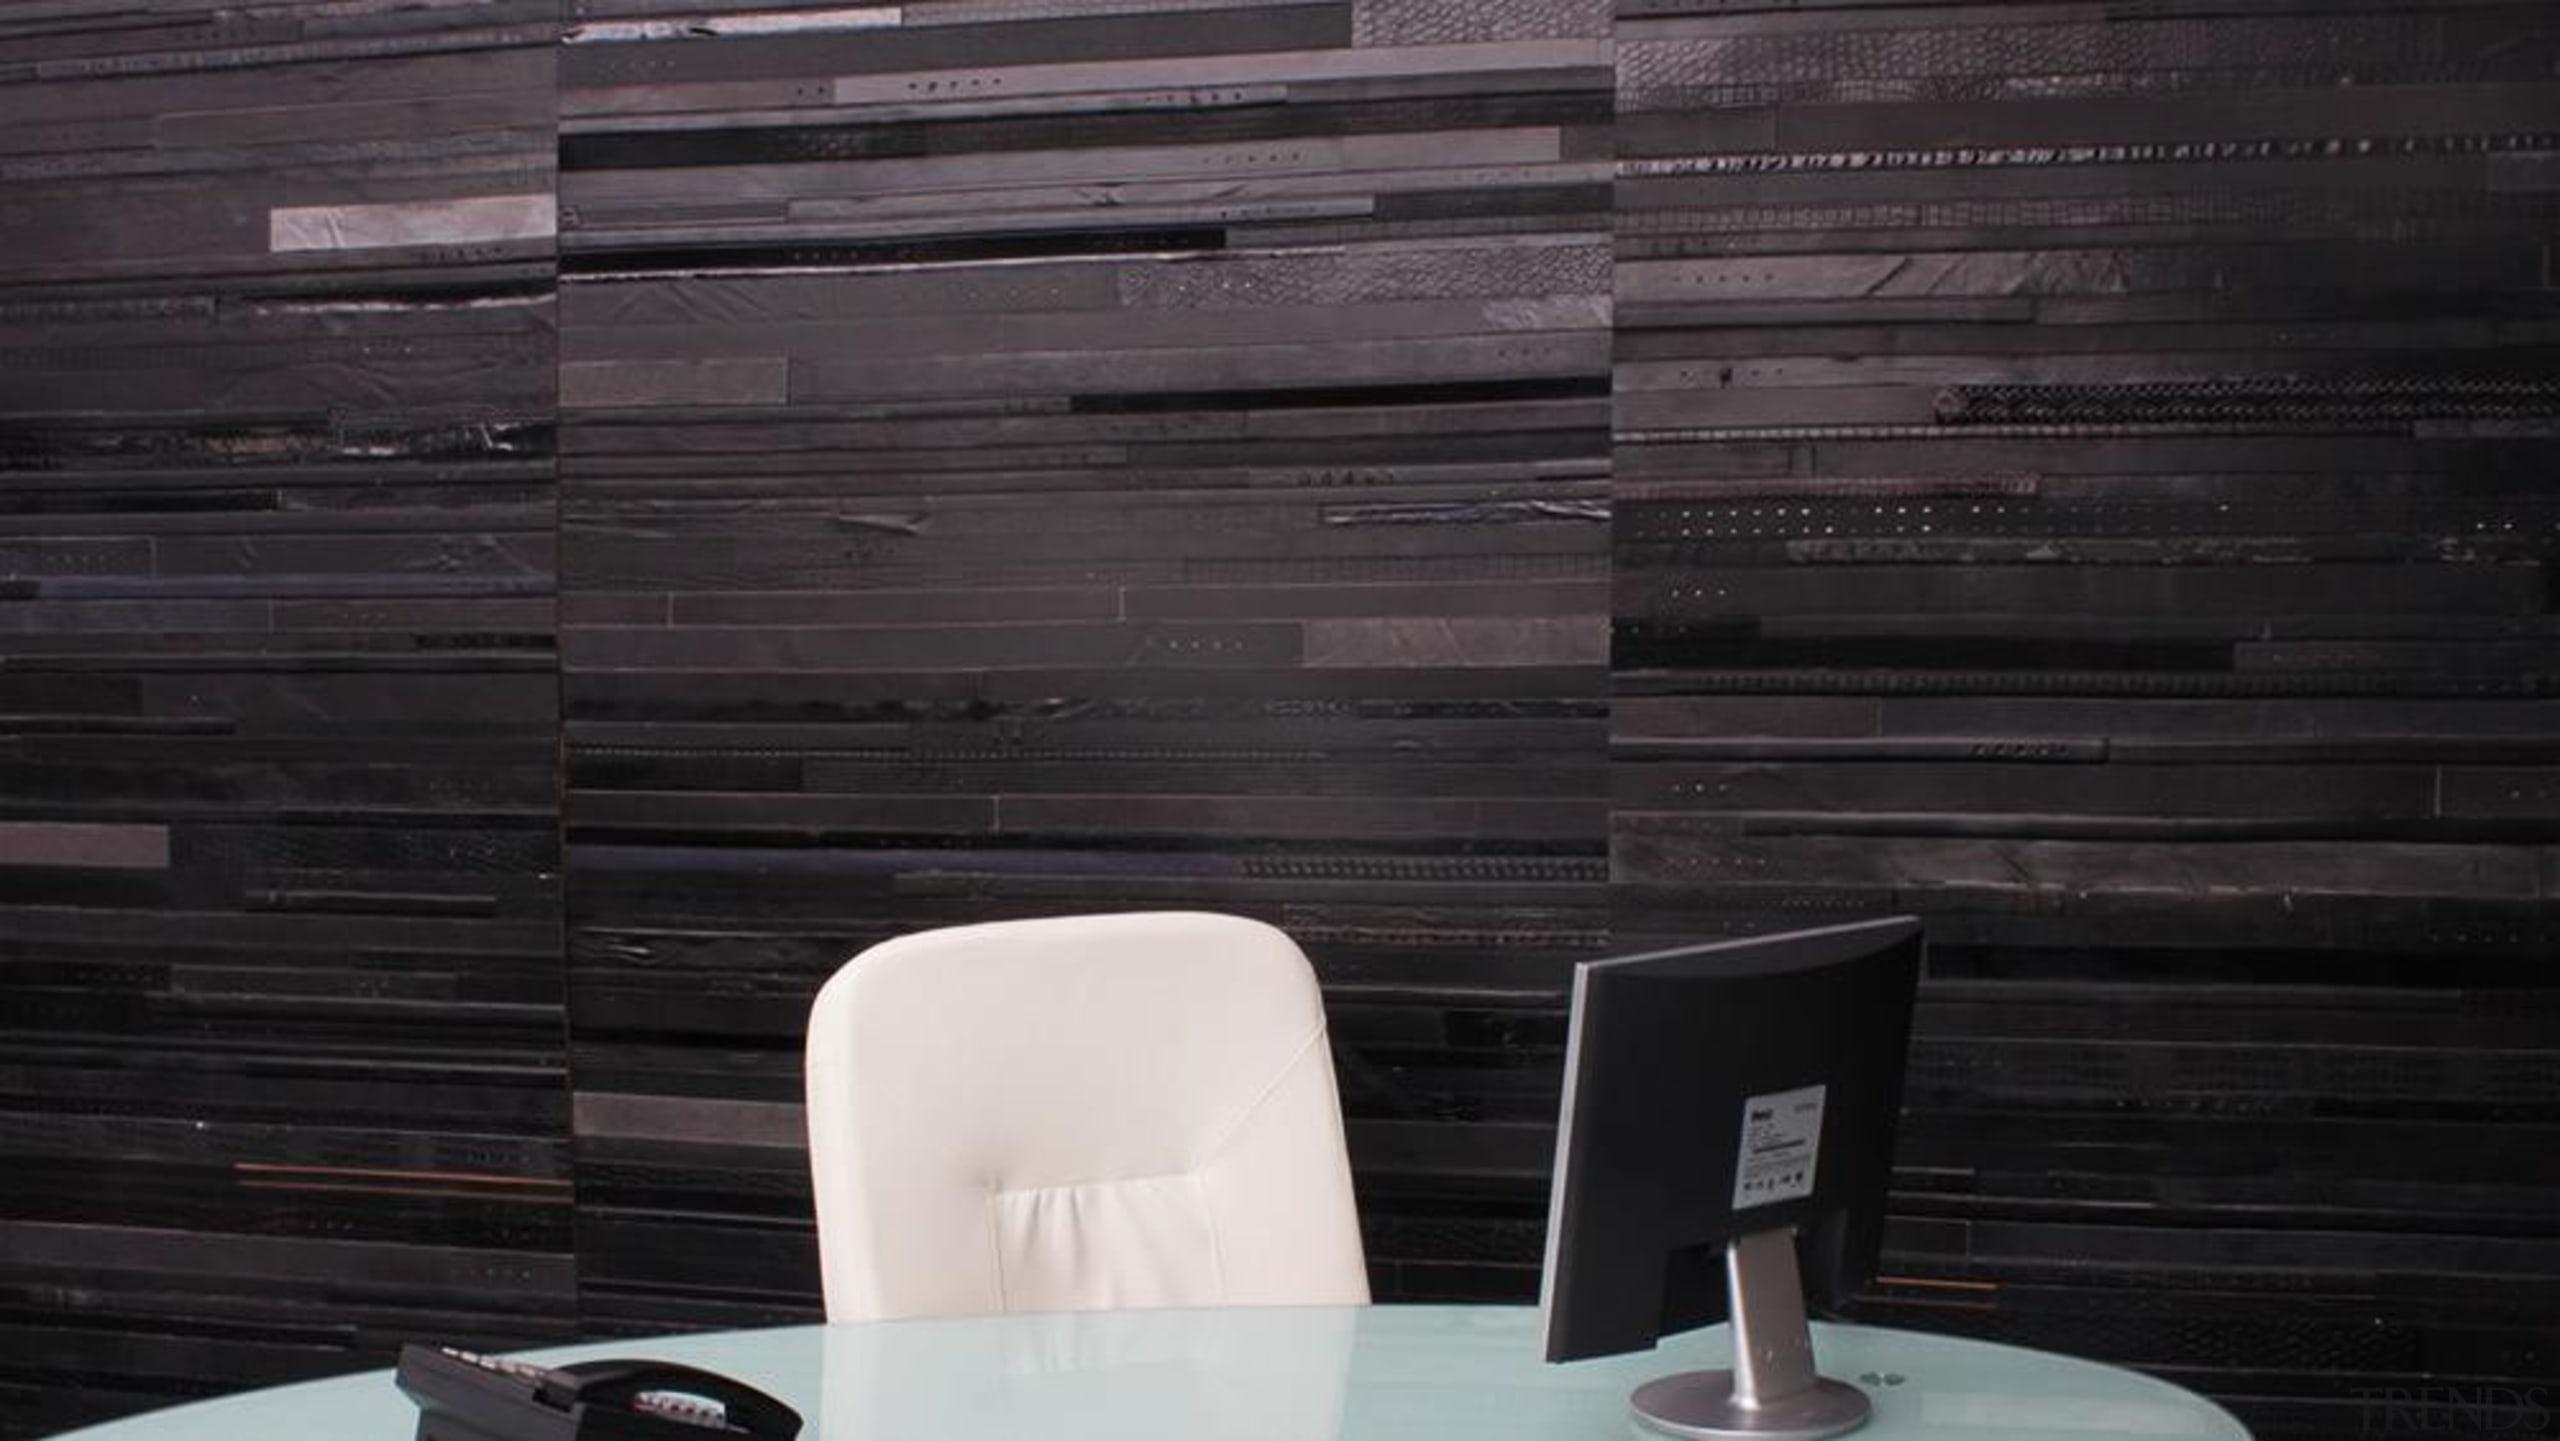 Phoenix Belt Collection - Phoenix Belt Collection - floor, flooring, furniture, interior design, product design, tile, wall, wood, wood flooring, black